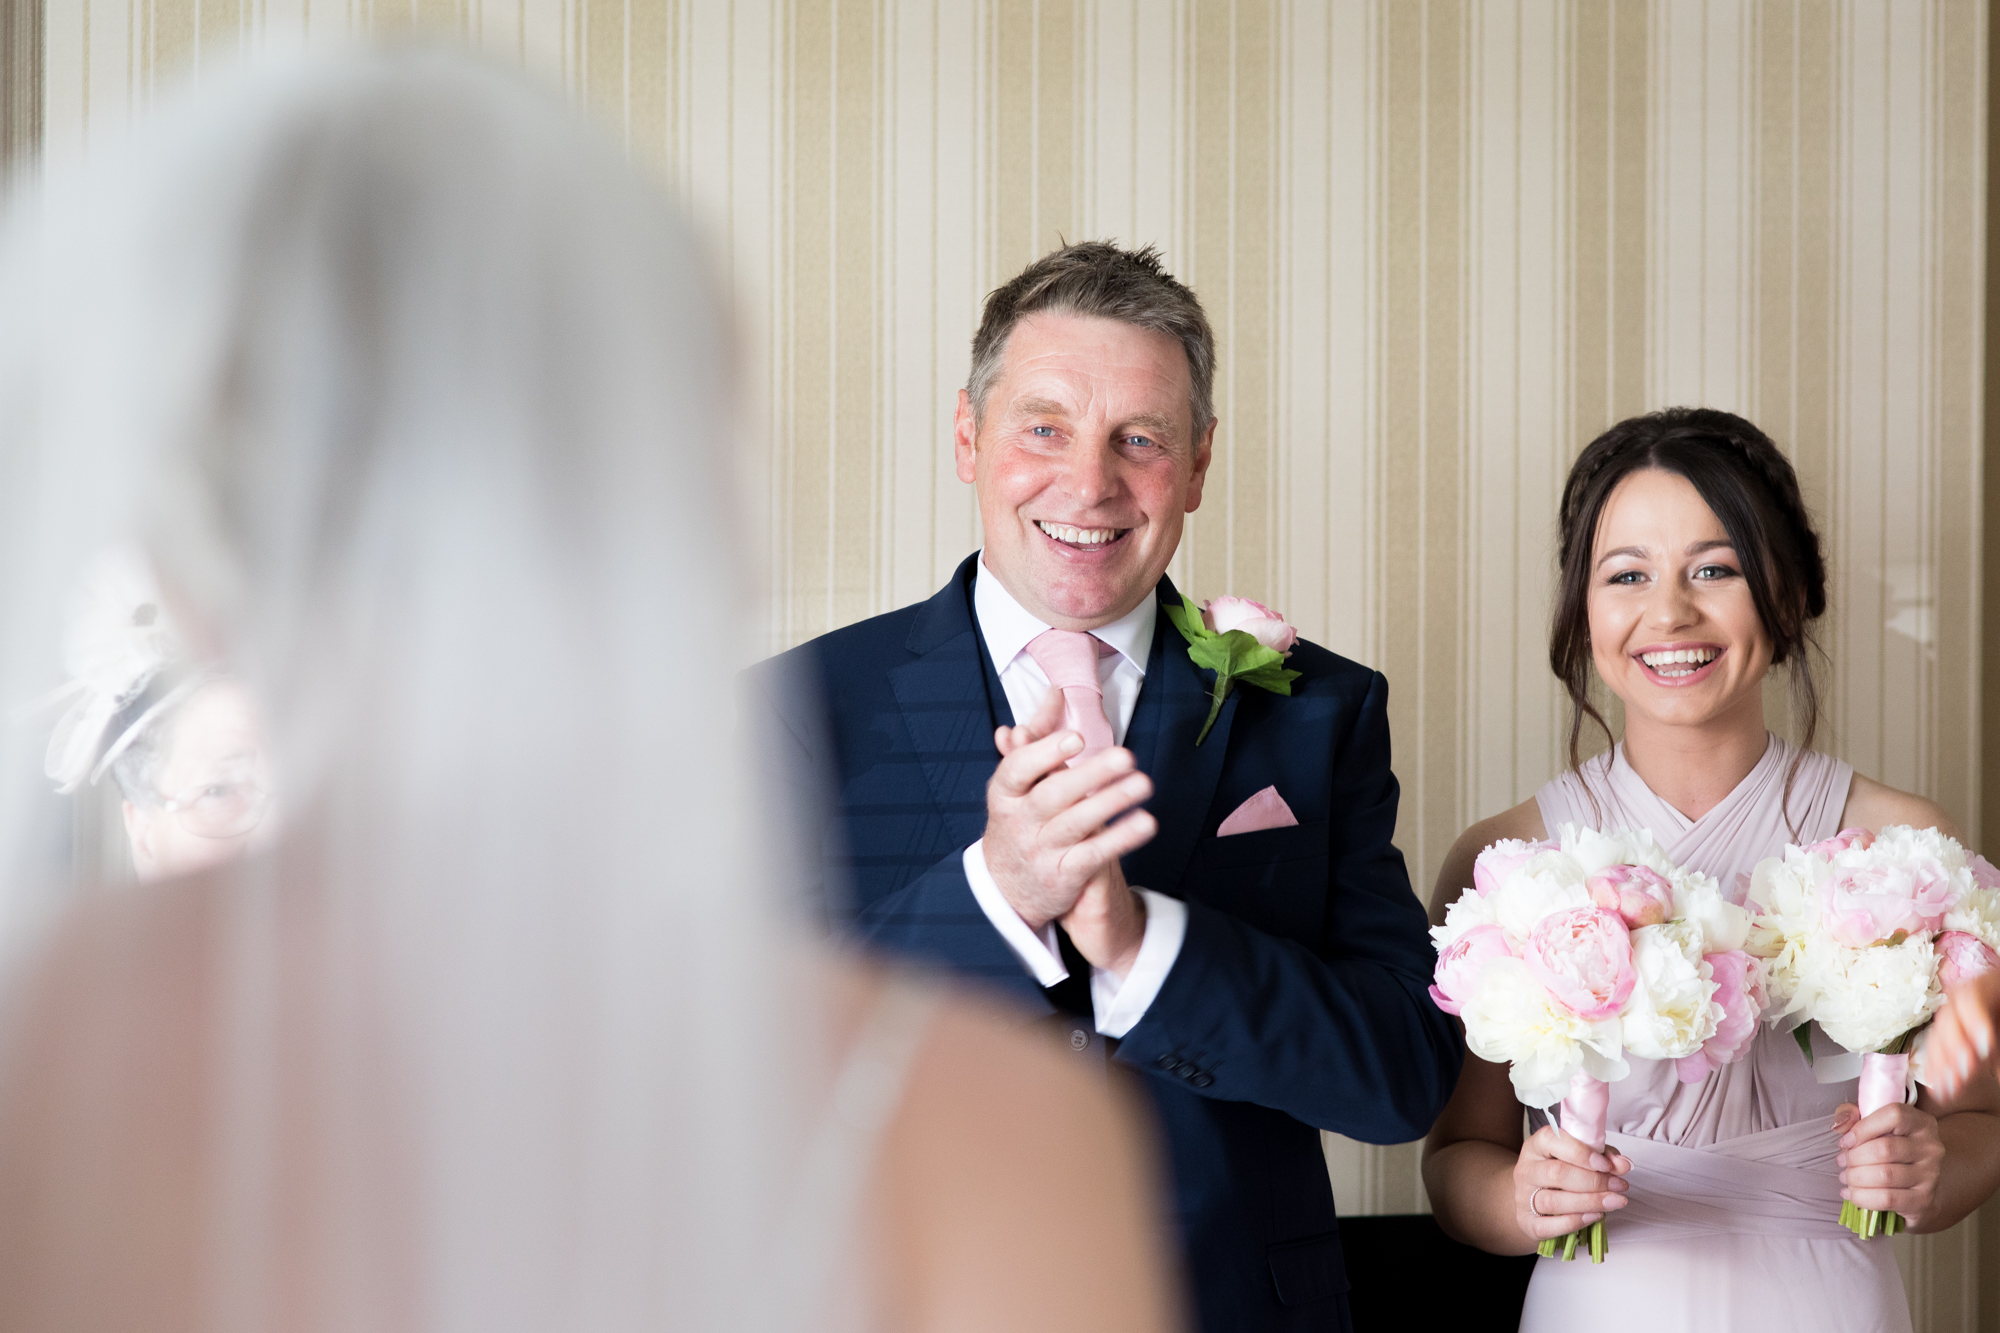 Headlam hall wedding photographer-1-9.jpg